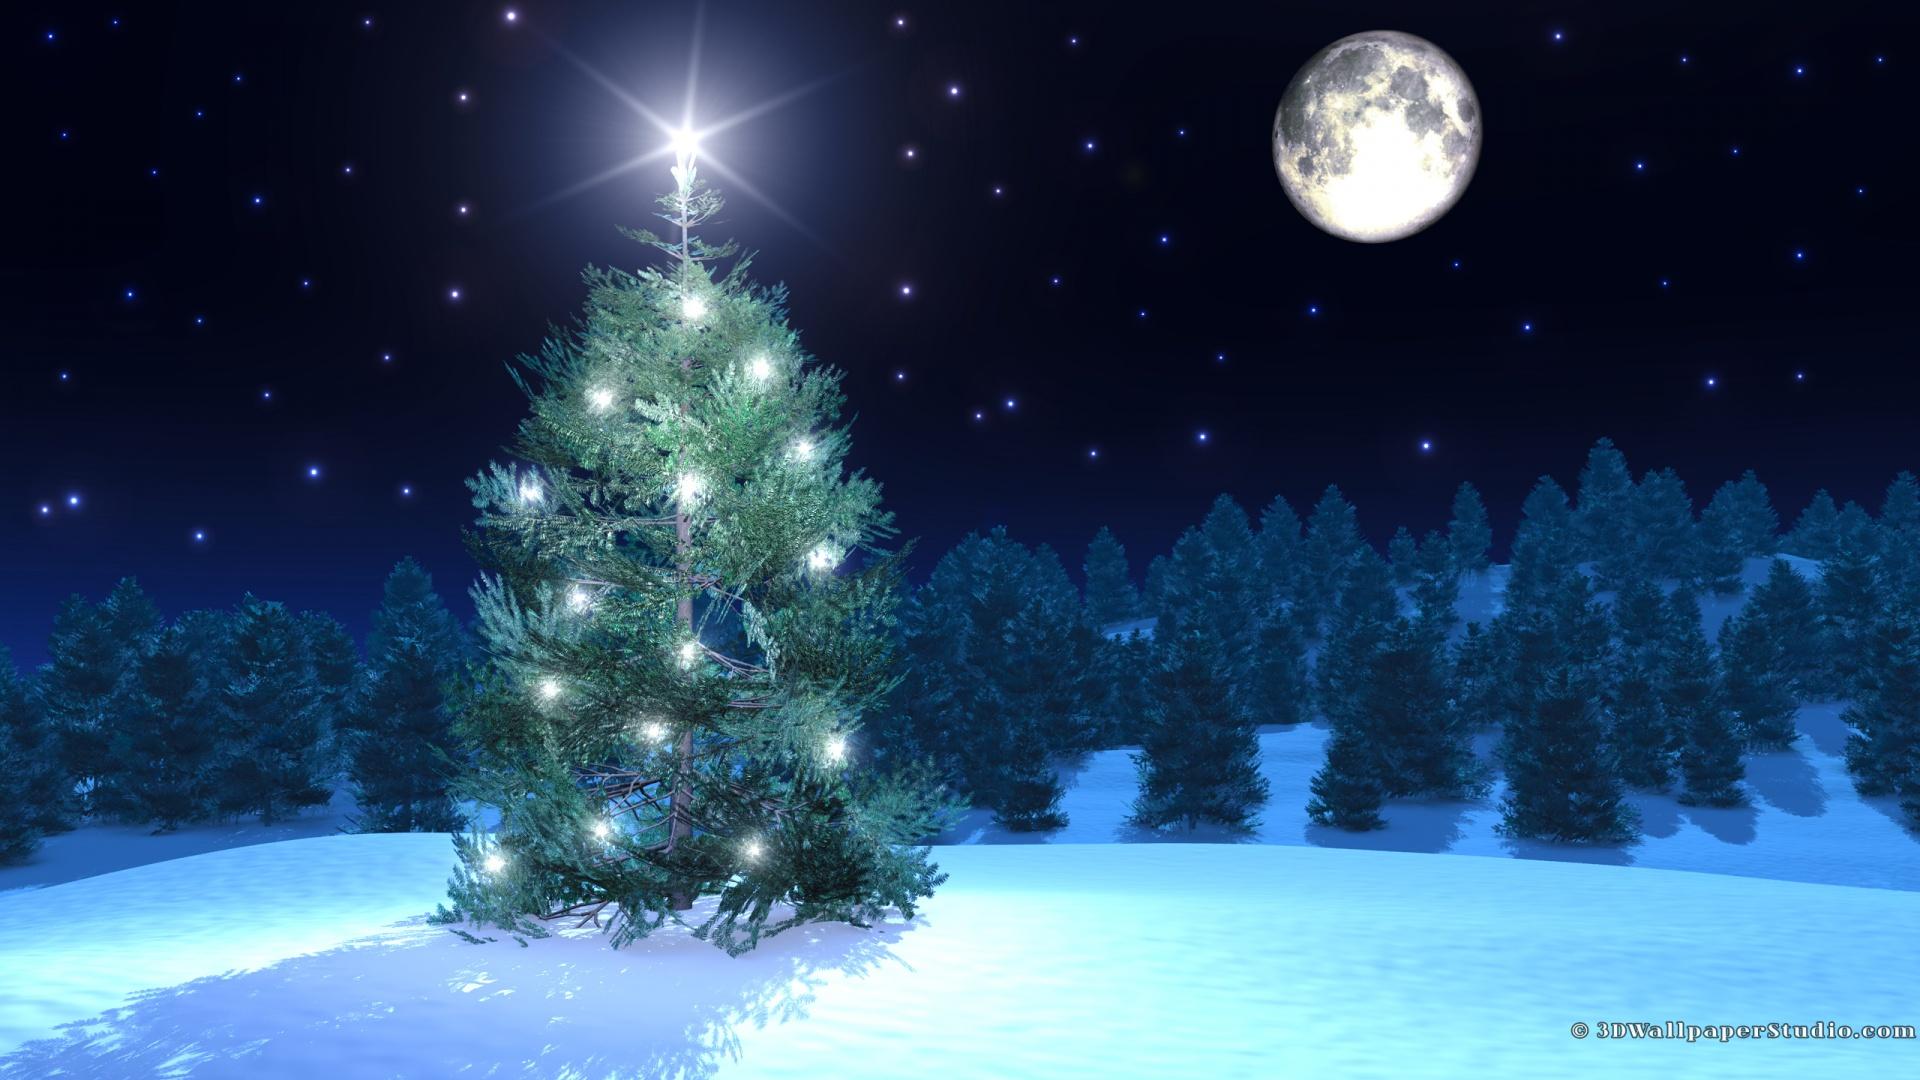 3D Wallpaper Christmas tree 1920 x 1080 1920x1080